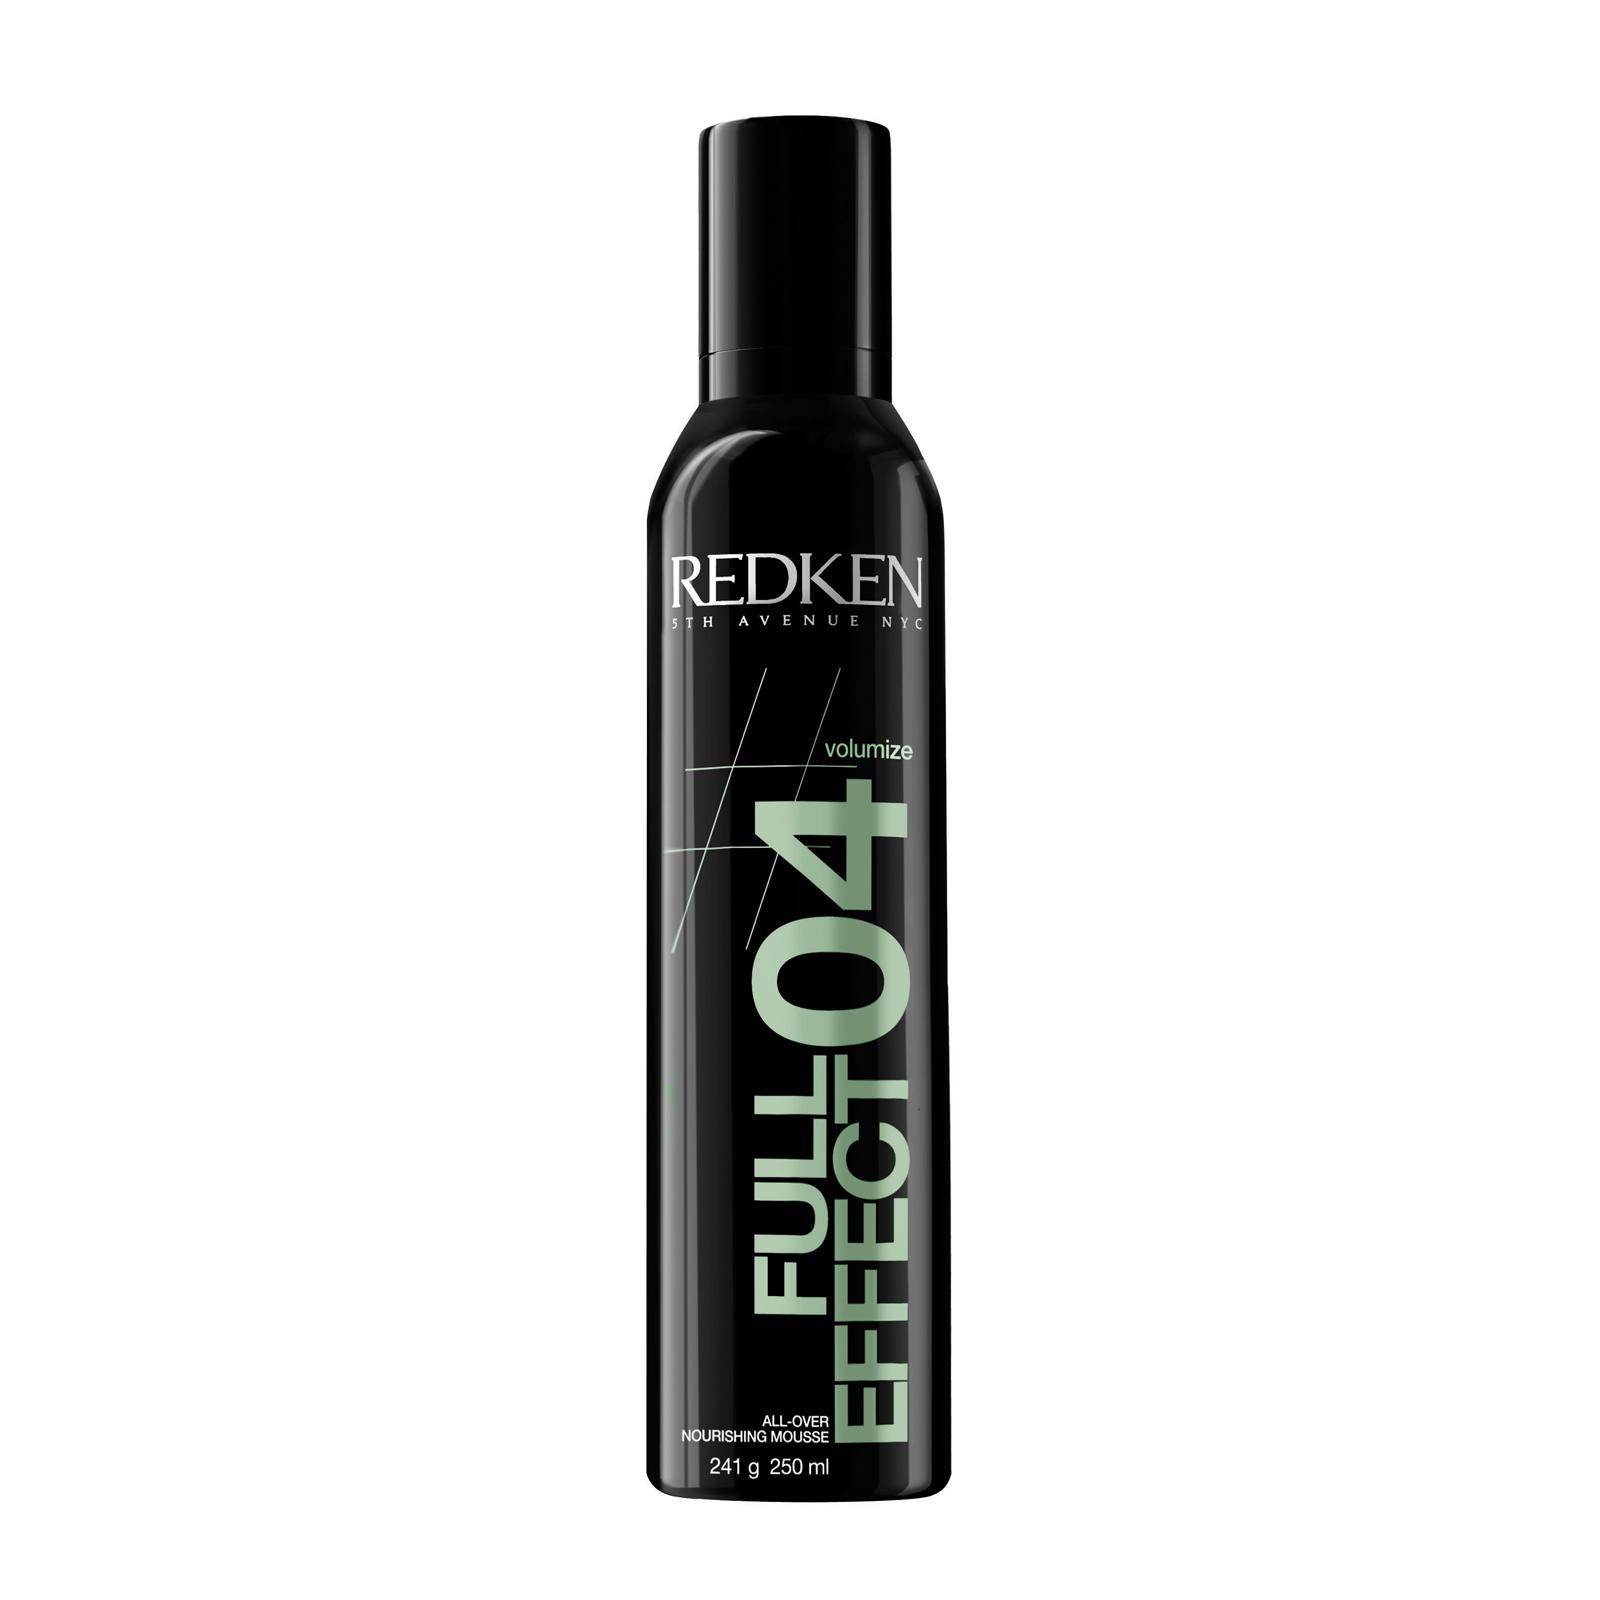 Redken styling products playa del ingles maspalomas for Salon redken